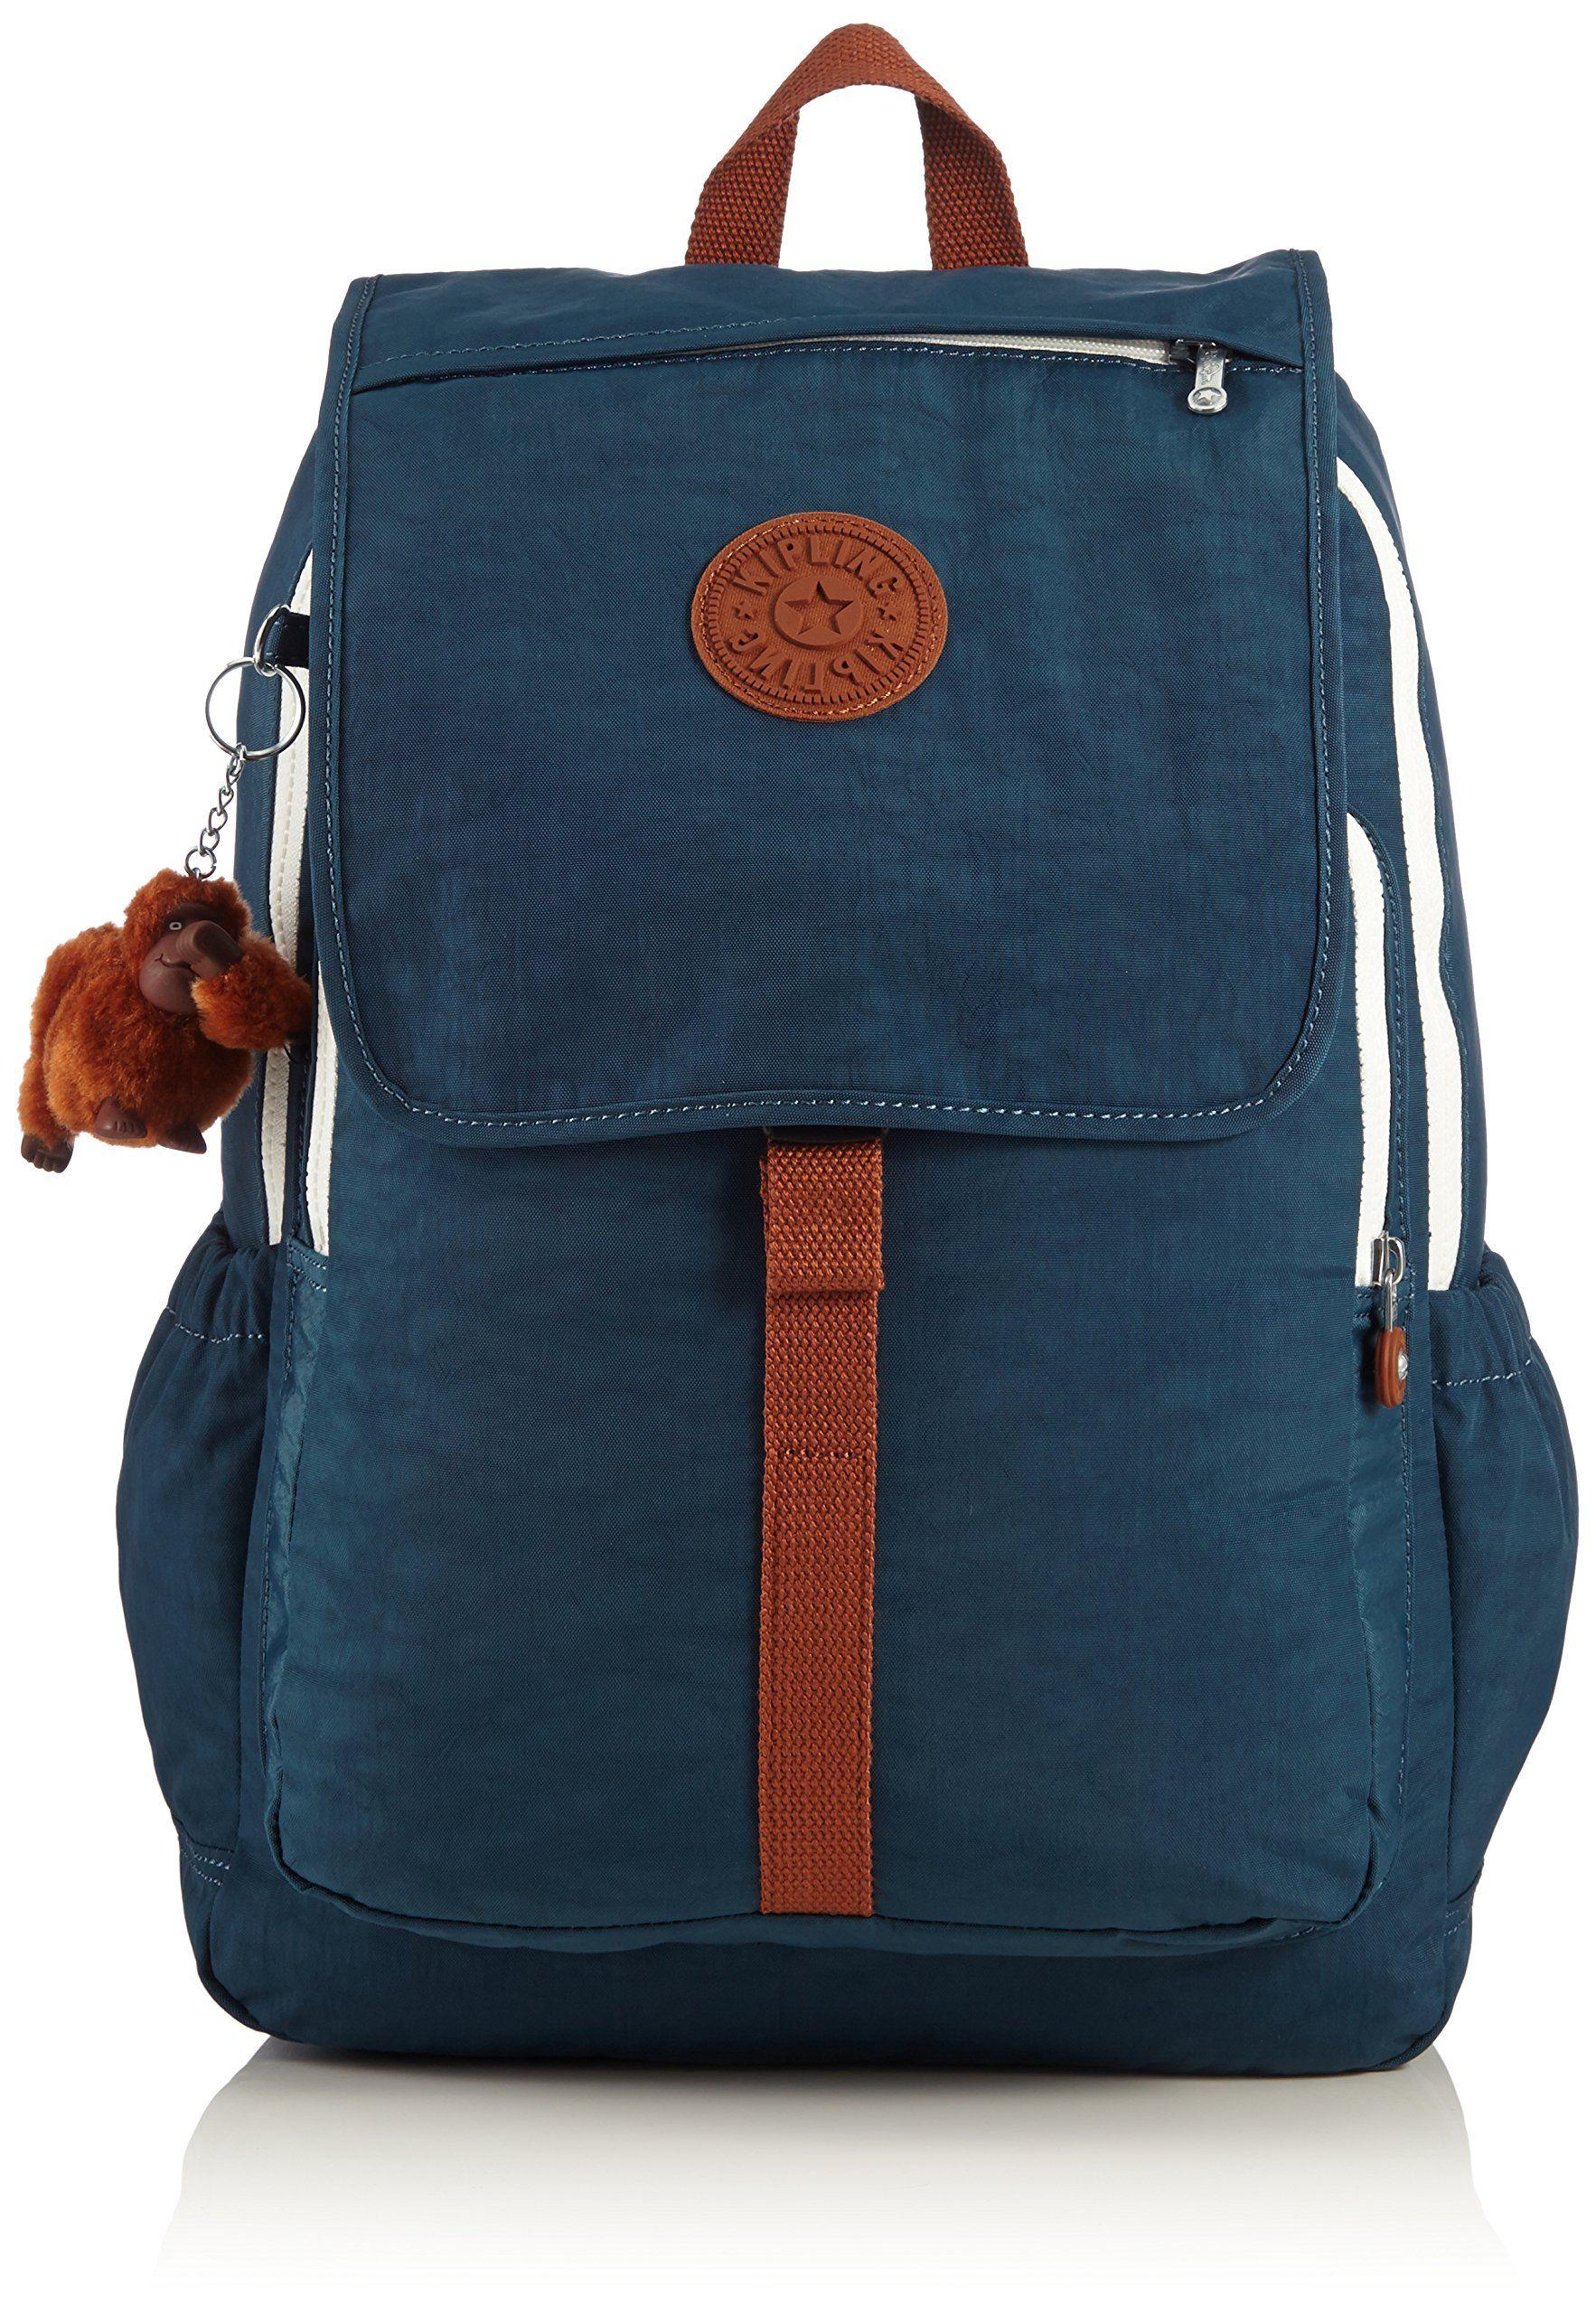 Kipling Casual Daypack Haruko 25 liters Multicolour (Drop Print) K15377B44: Amazon.co.uk: Luggage